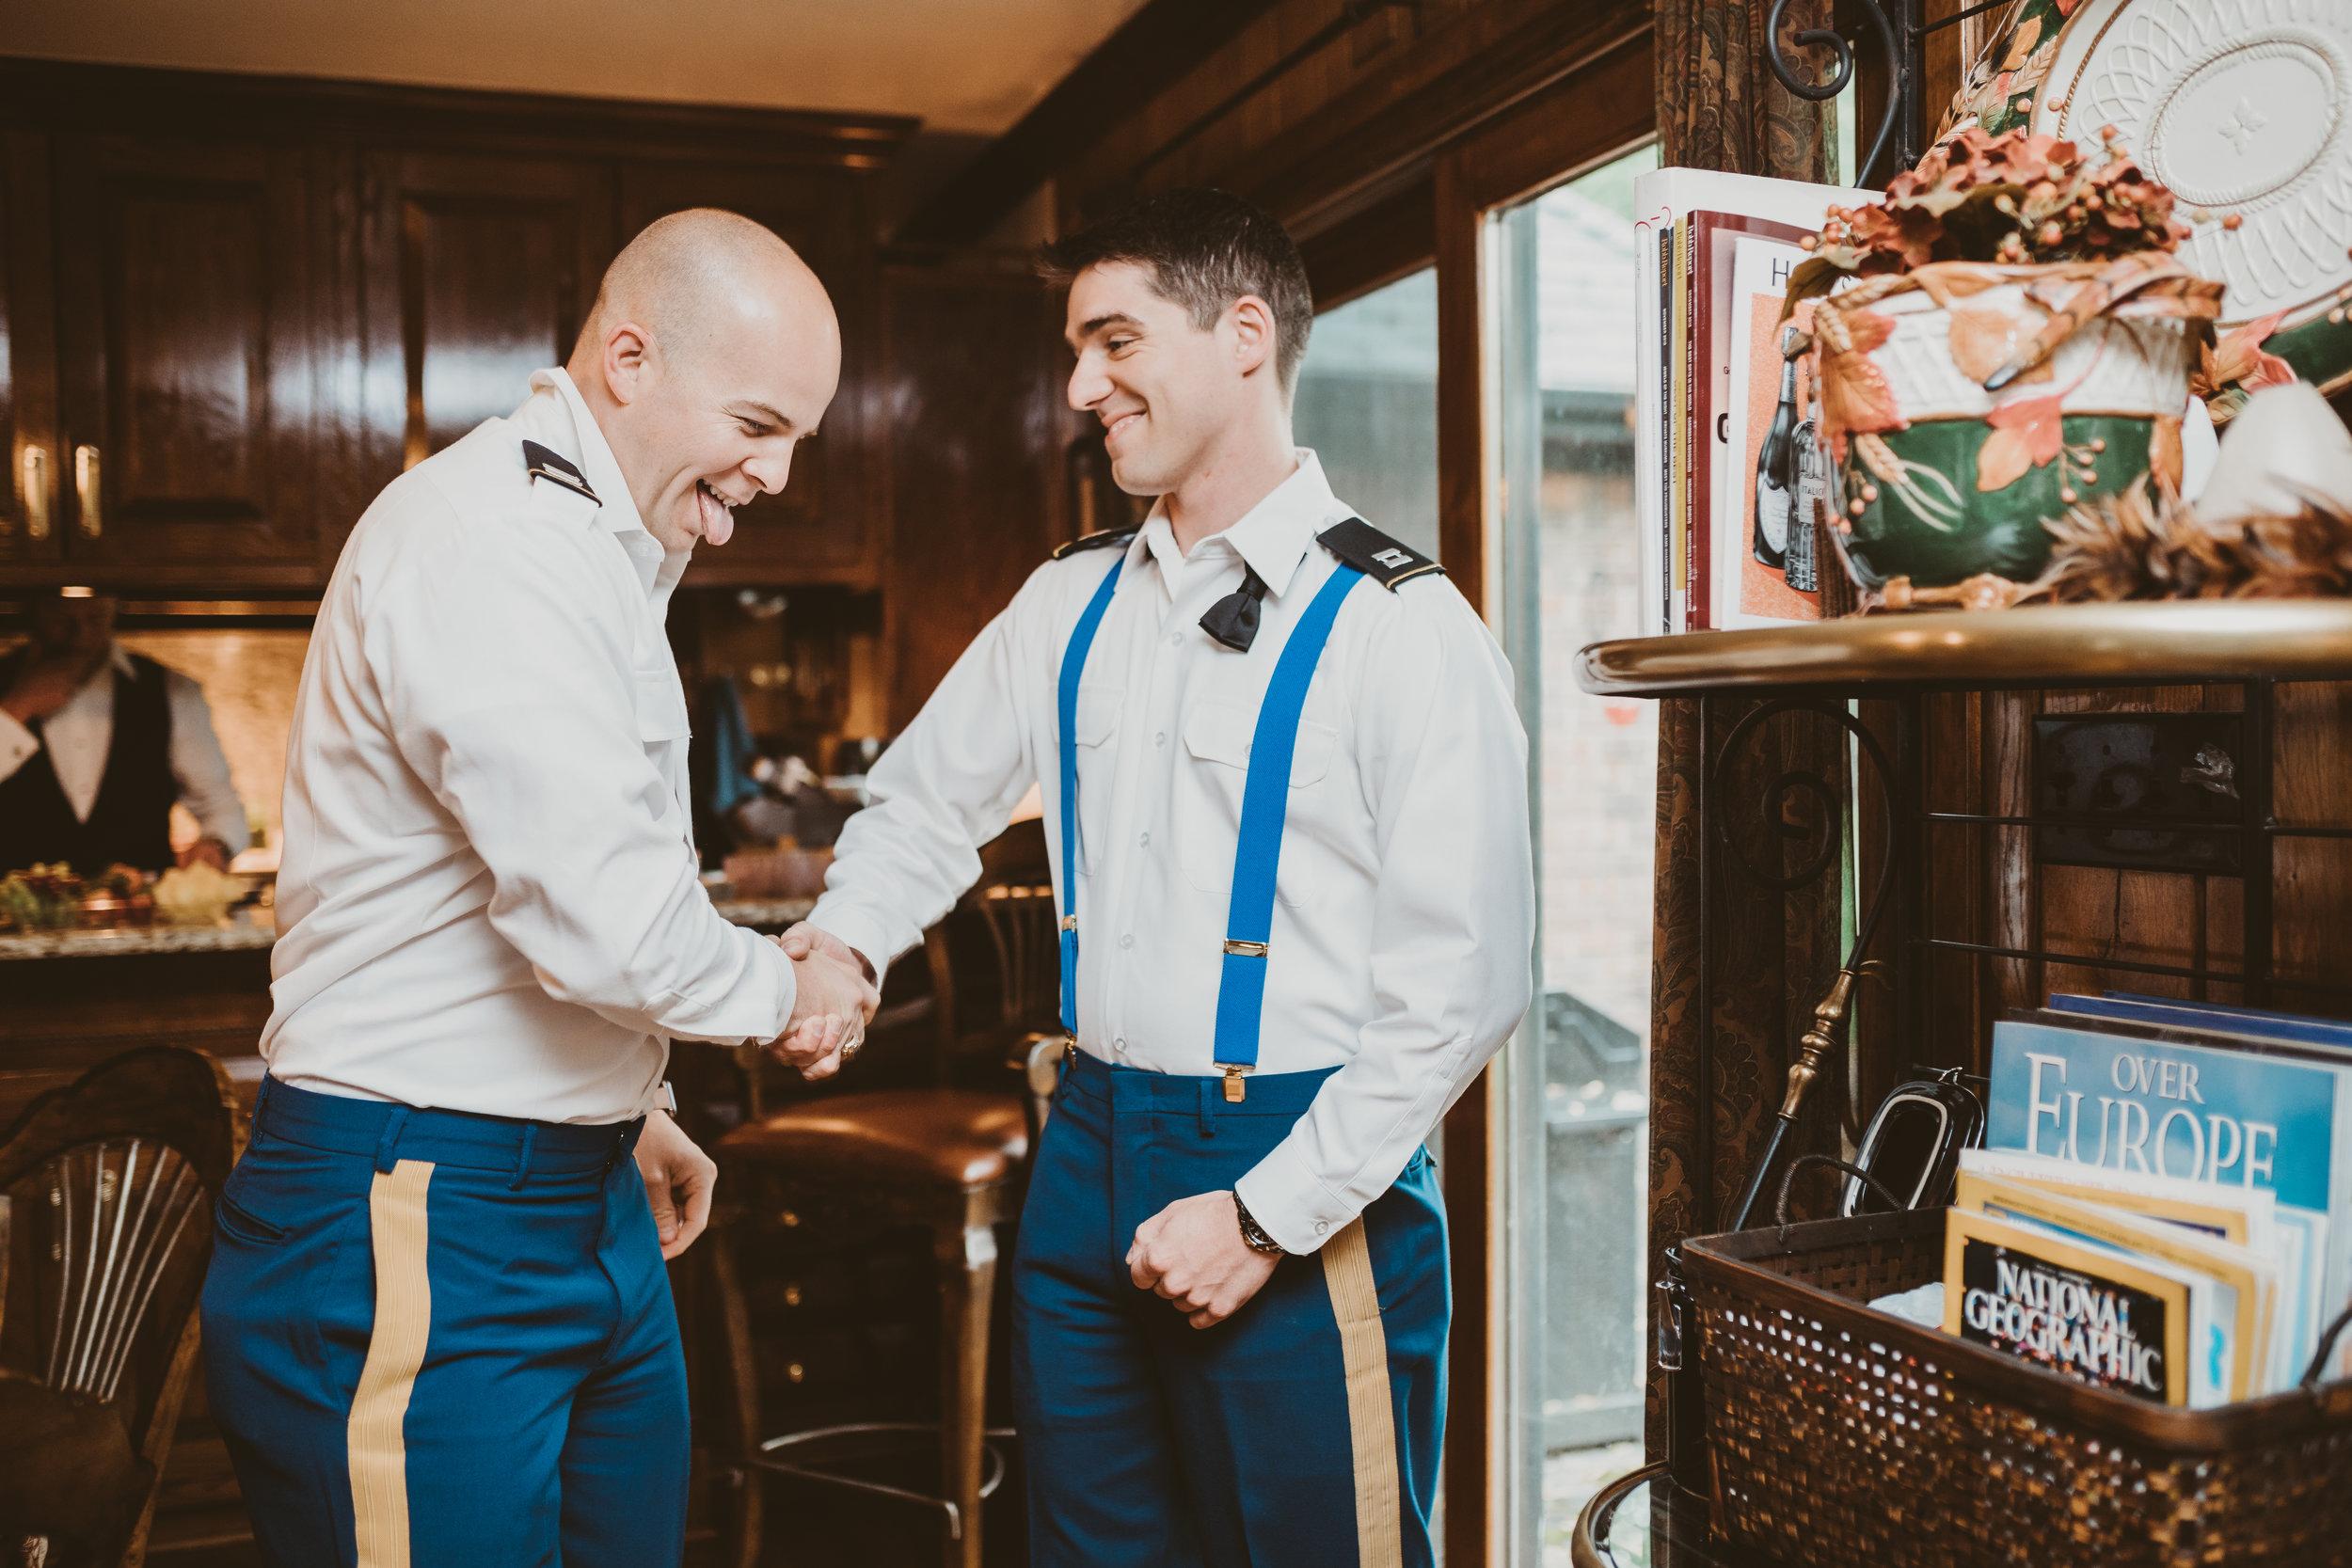 Lauren-ashley-studios-photography-groom-getting-ready.jpg